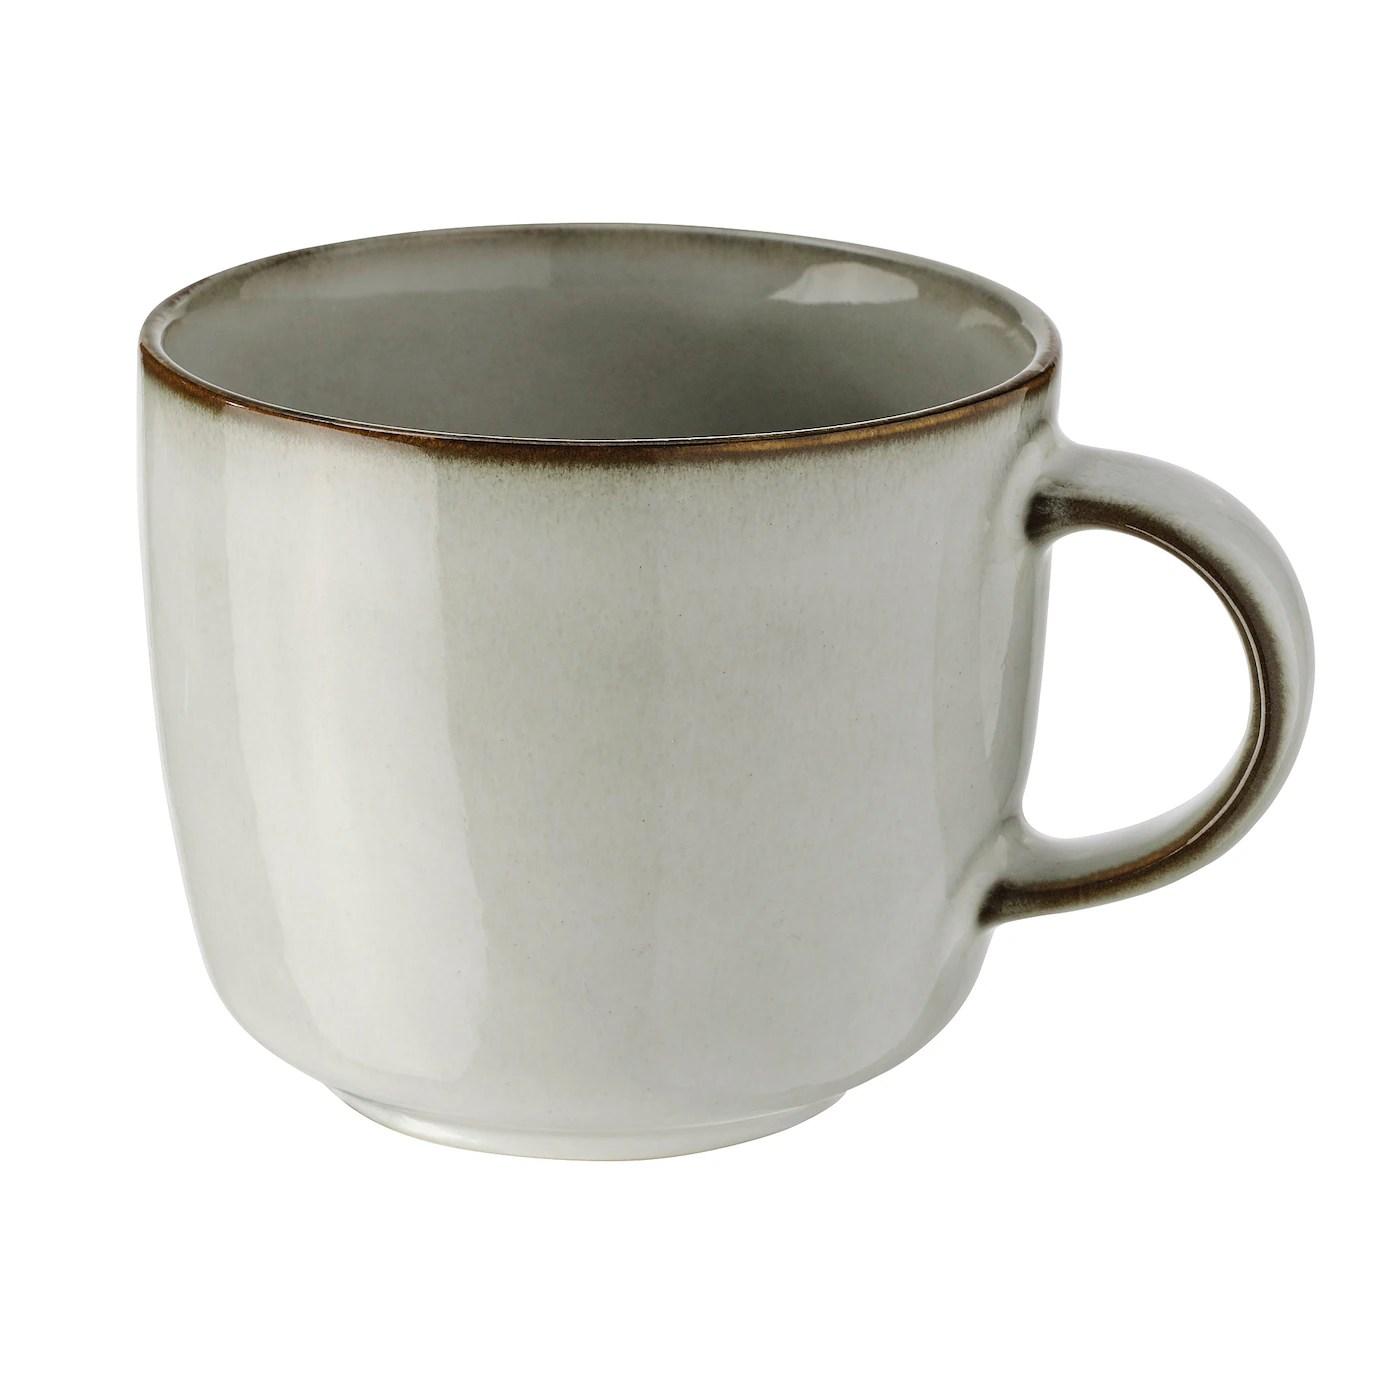 tasses et mugs ikea